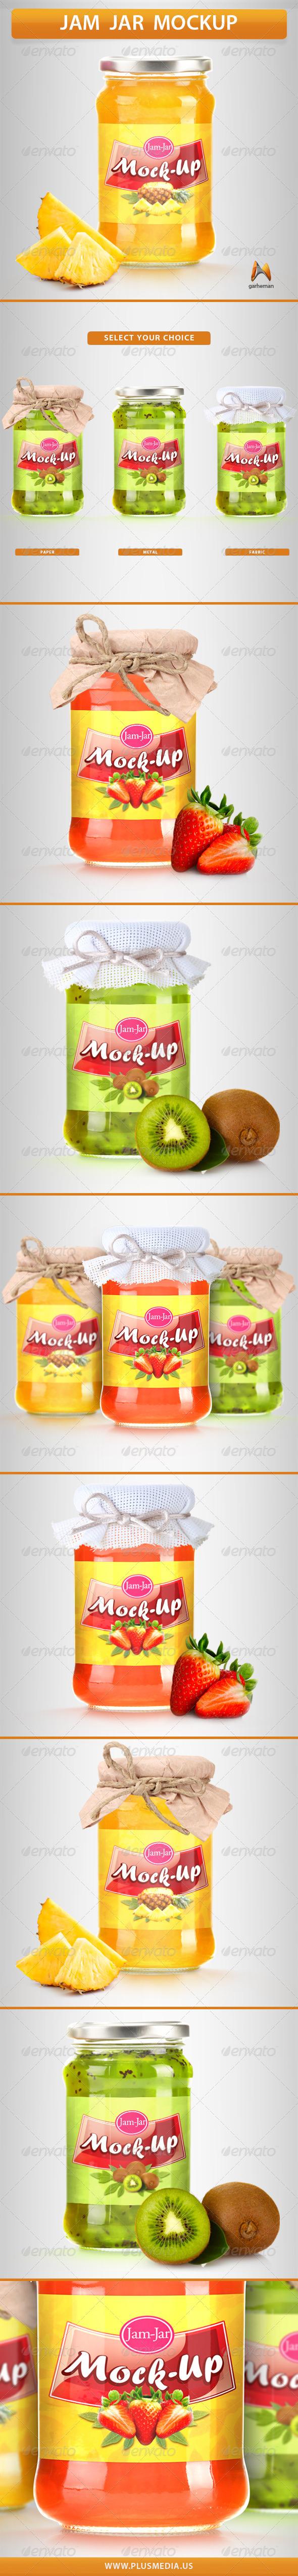 Jam Jar Mockup - Product Mock-Ups Graphics